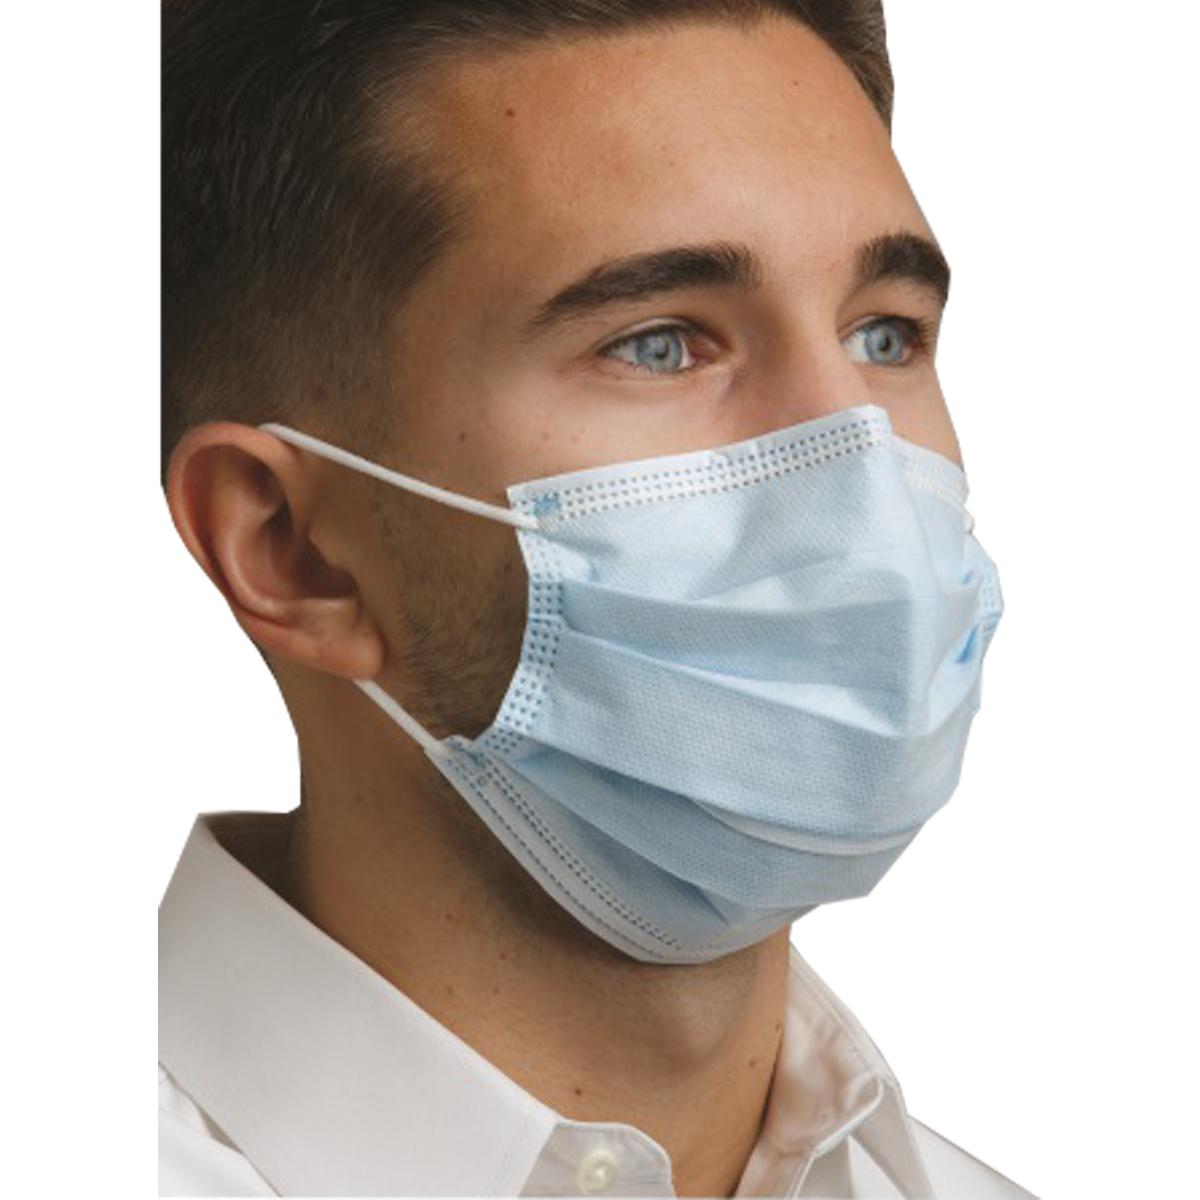 2211582 Defend Level 2 Dual Fit Earloop Masks Blue, 50/Box, MK7200